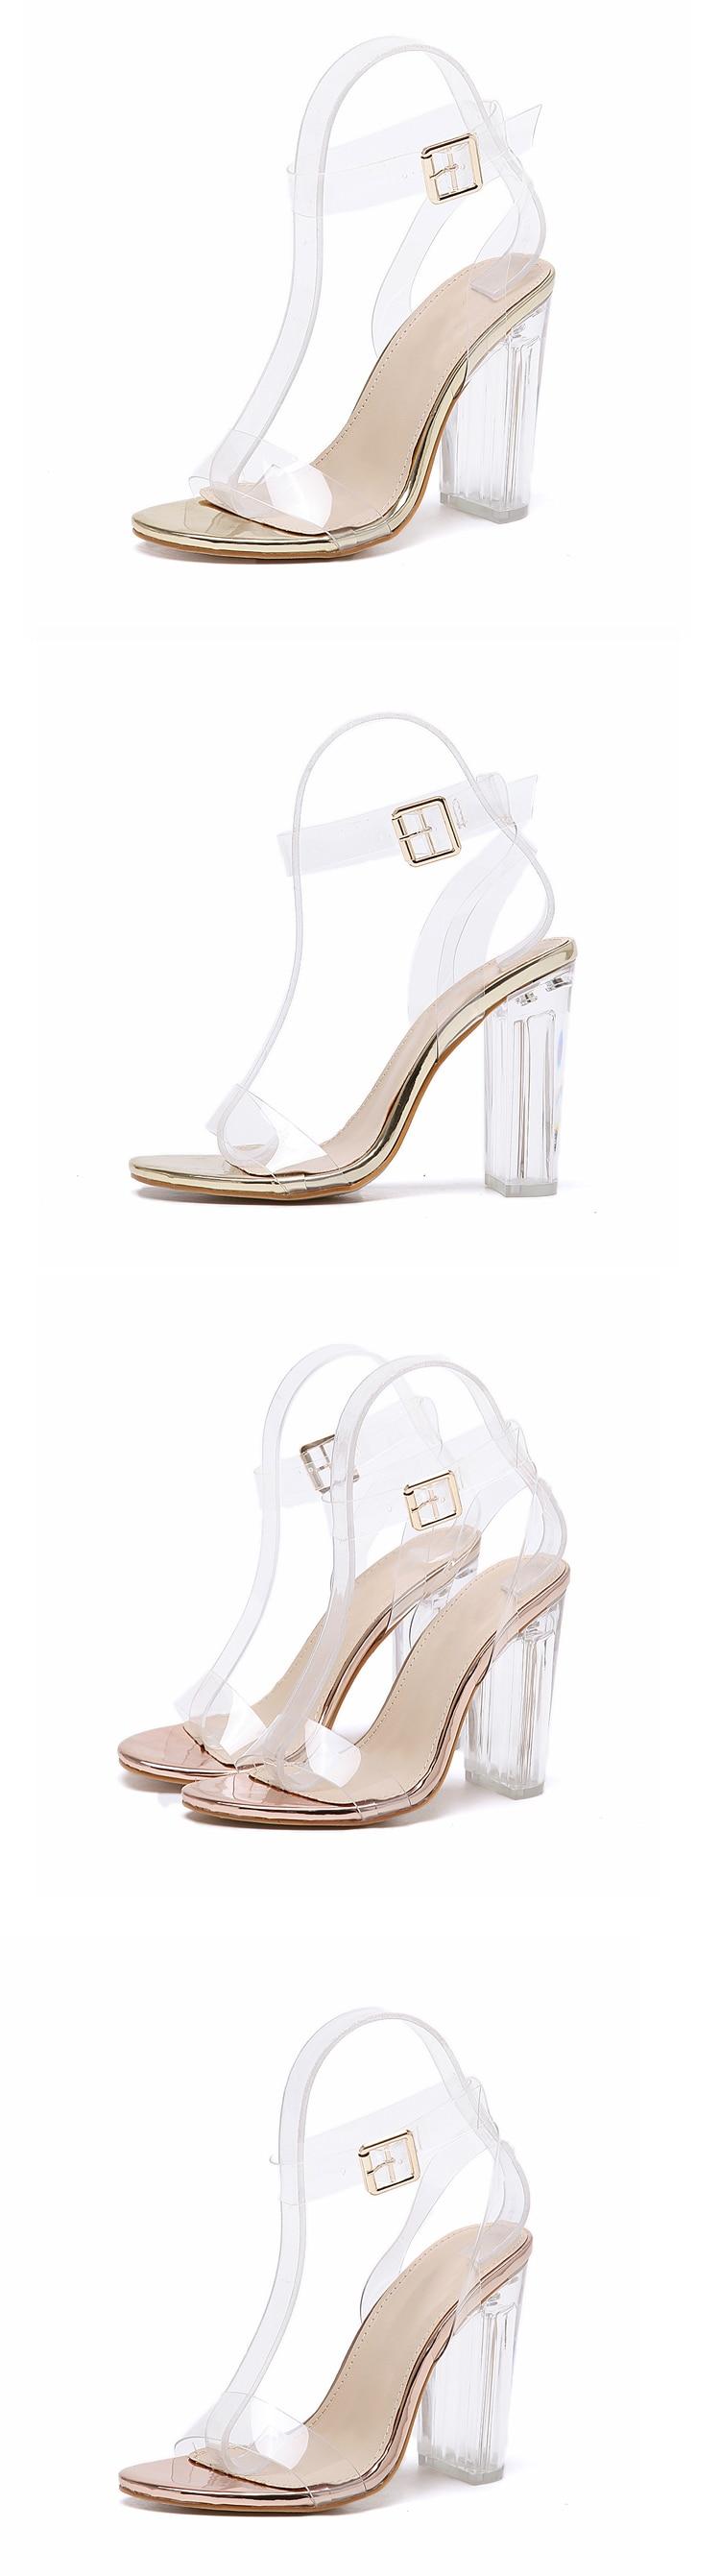 HTB1EBldXdfvK1RjSspfq6zzXFXah Eilyken 2019 PVC Jelly Sandals Crystal Leopard Open Toed High Heels Women Transparent Heel Sandals Slippers Discount Pumps 11CM